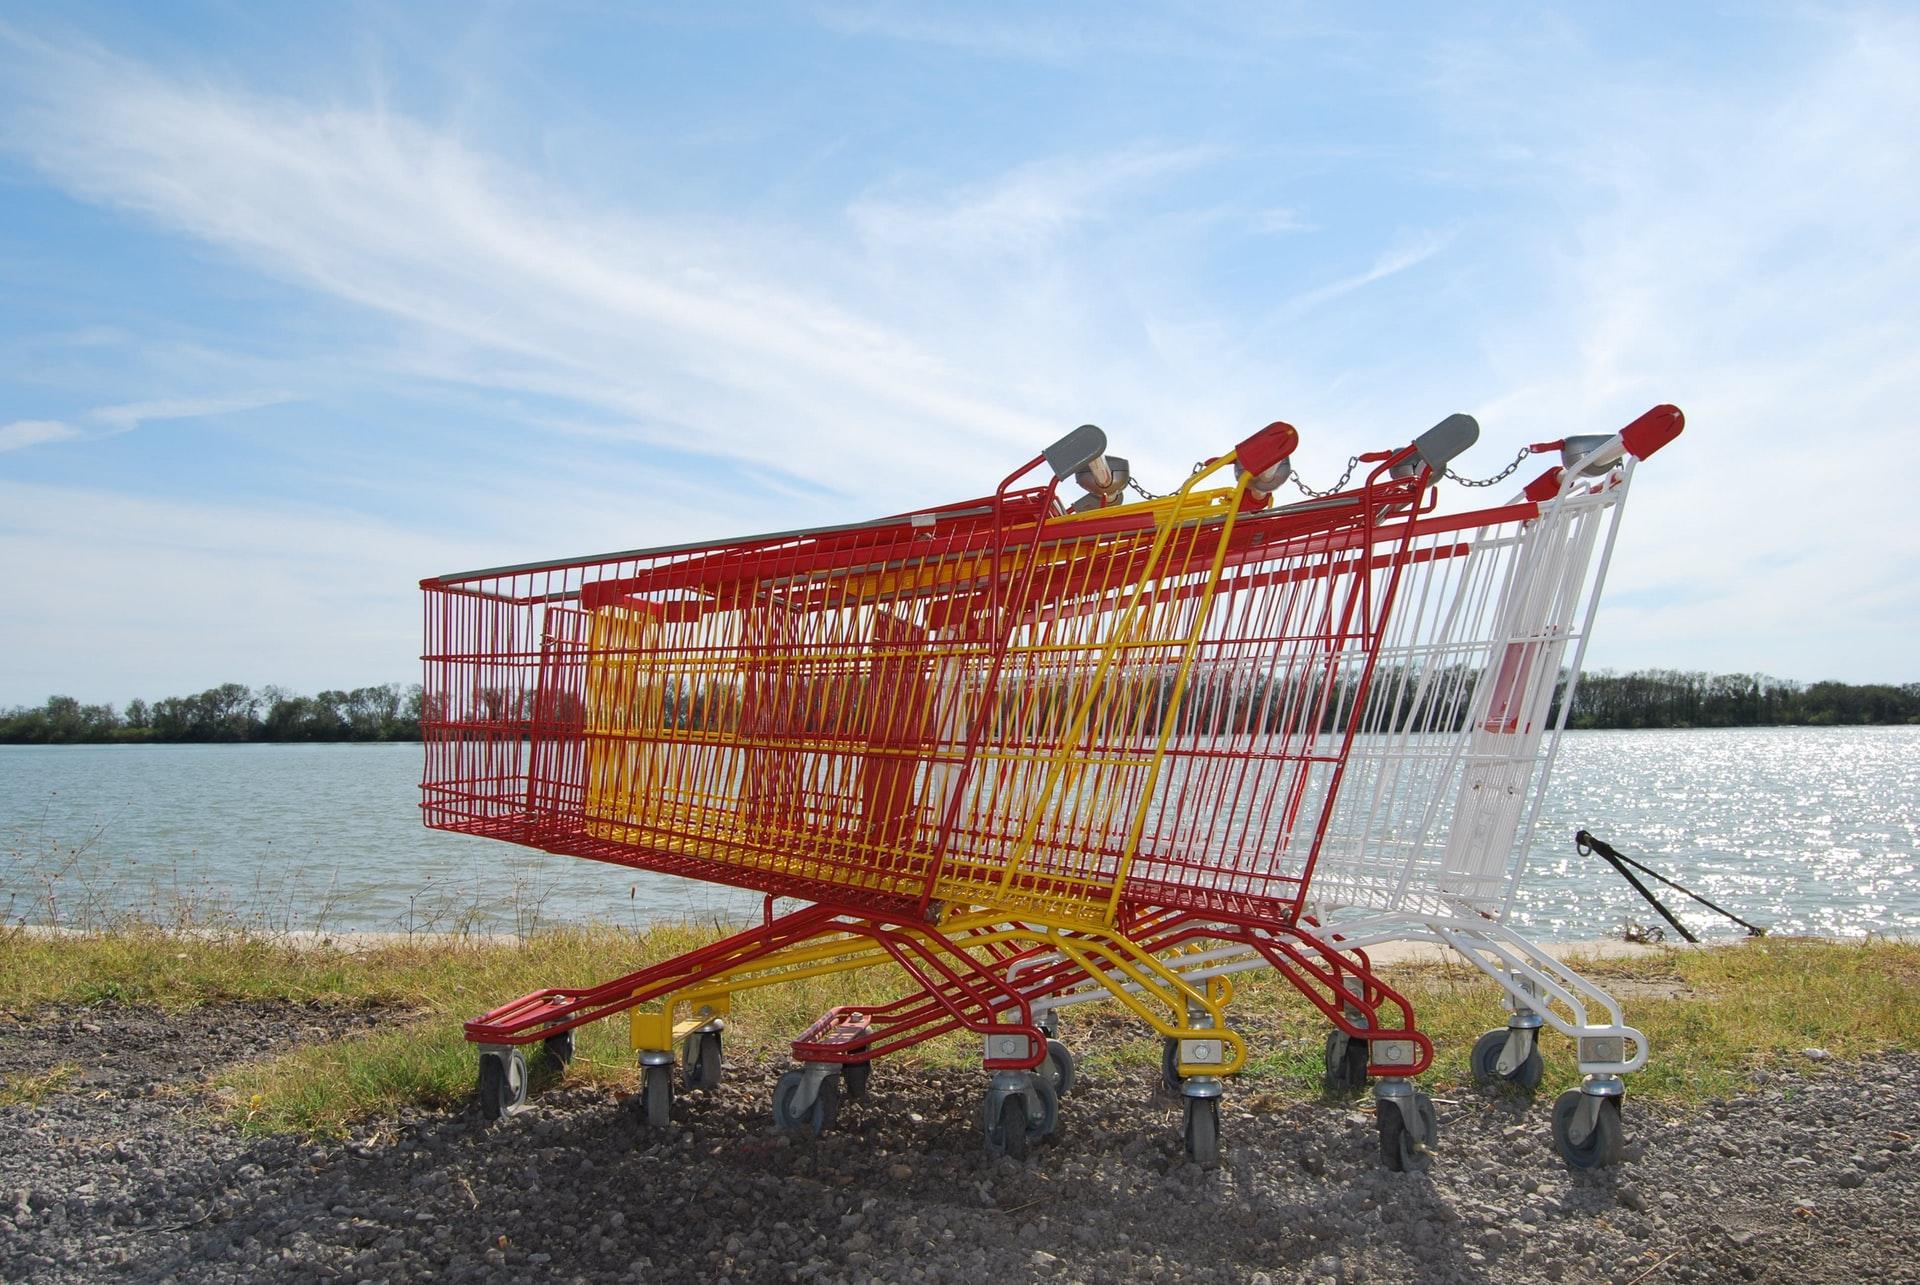 Abandoned shopping trolleys.